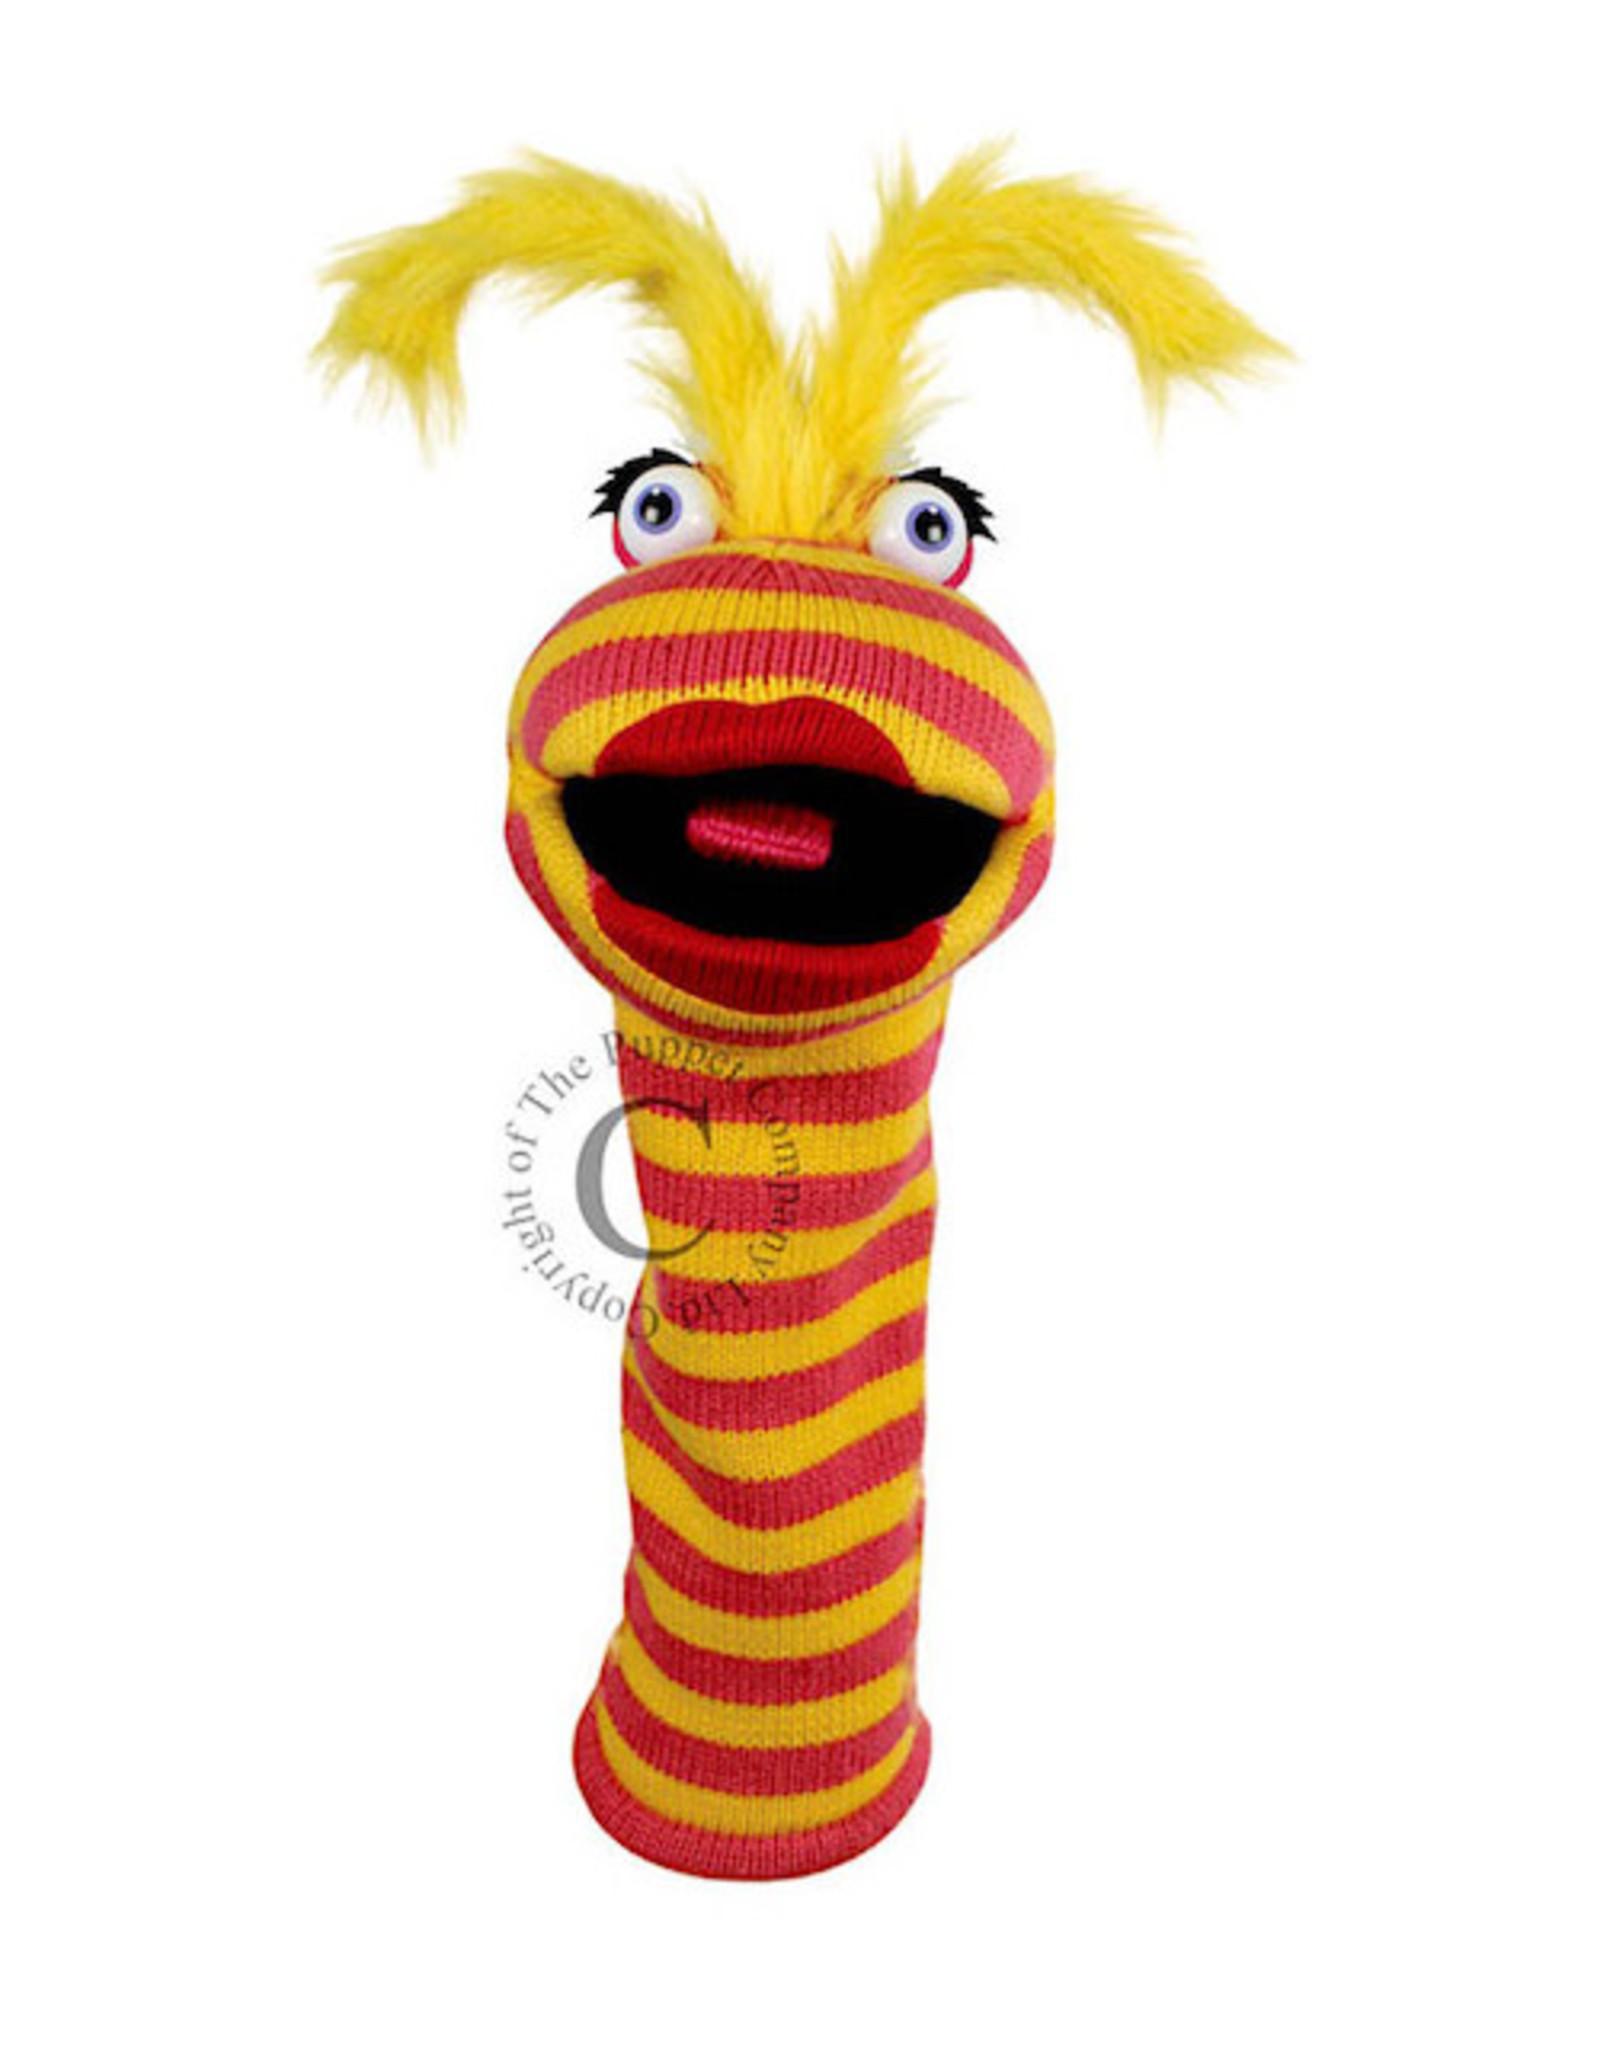 The Puppet Company Lipstick